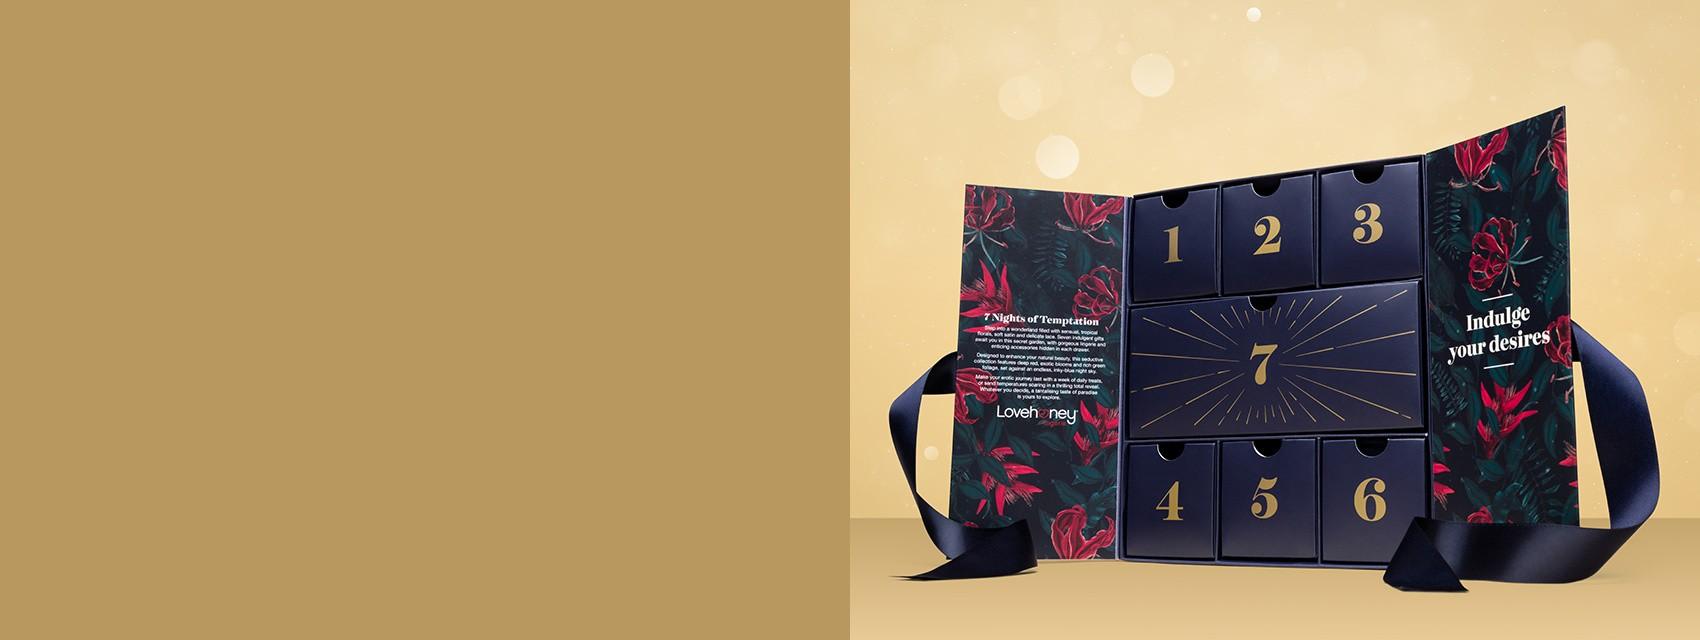 Desktop-Advent-Calendar-Lingerie-3